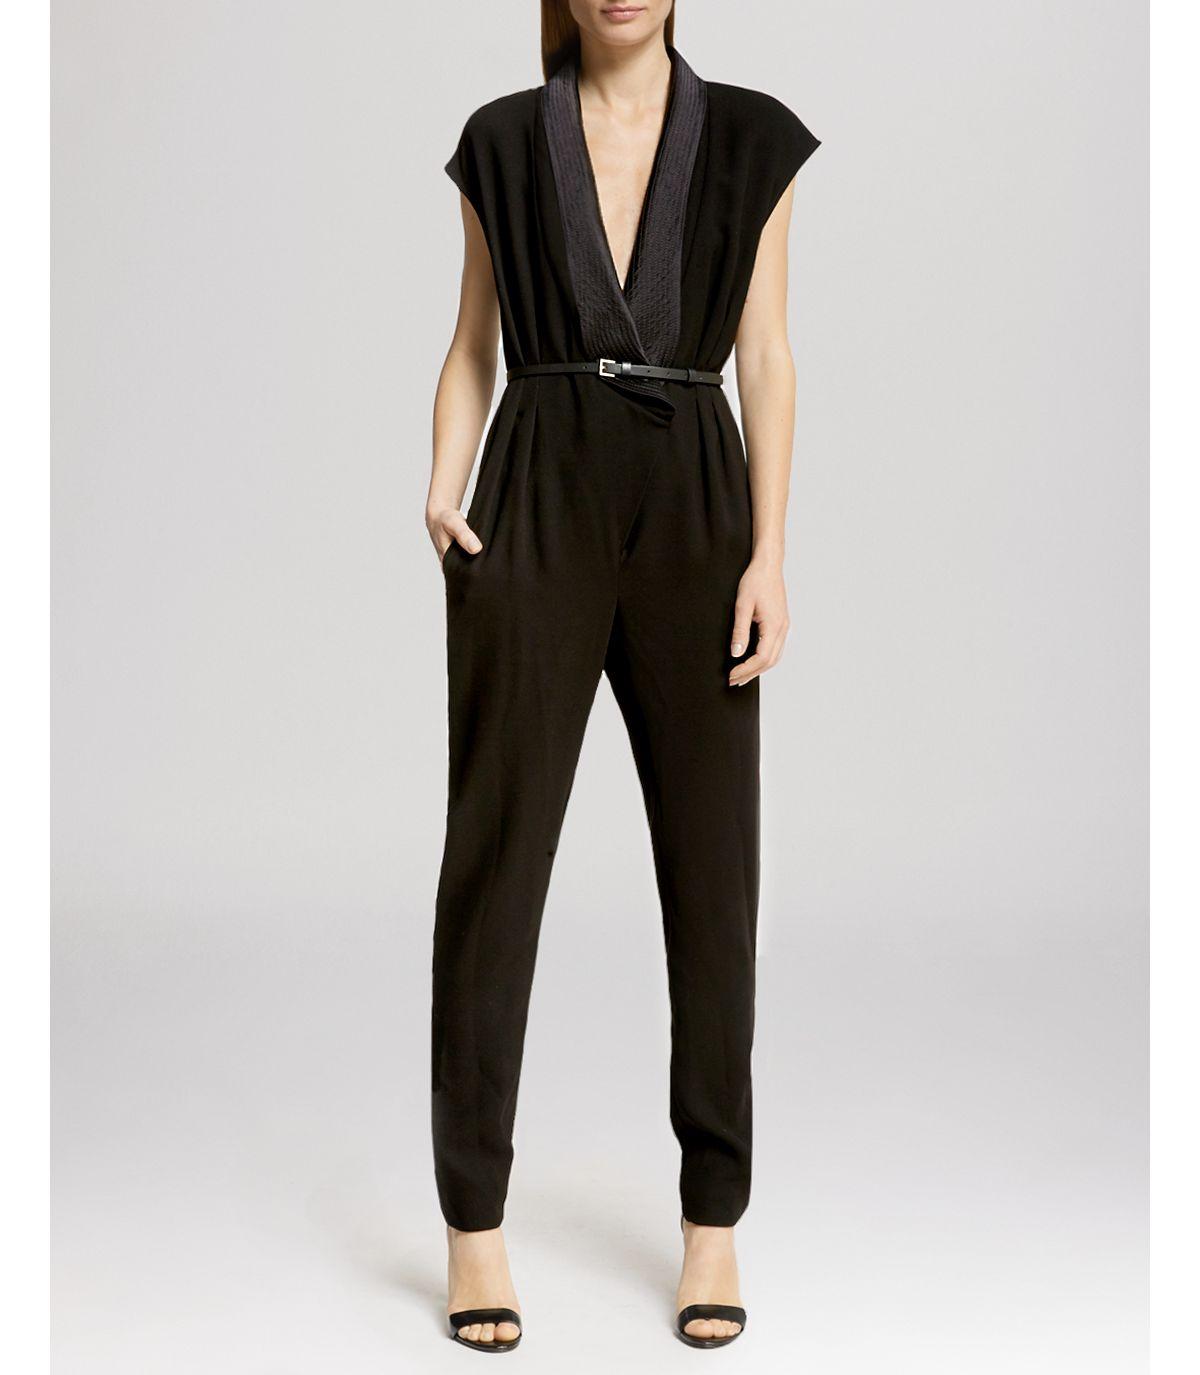 60b2a22bde7 Lyst - Halston Jumpsuit - Cap Sleeve V-neck in Black